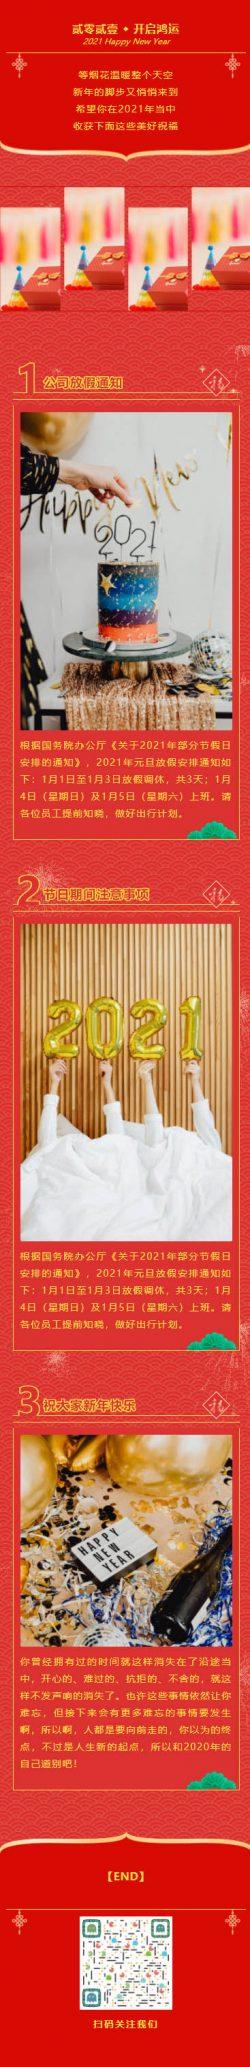 2021 Happy New Year新年快乐元旦微信推文素材跨年模板